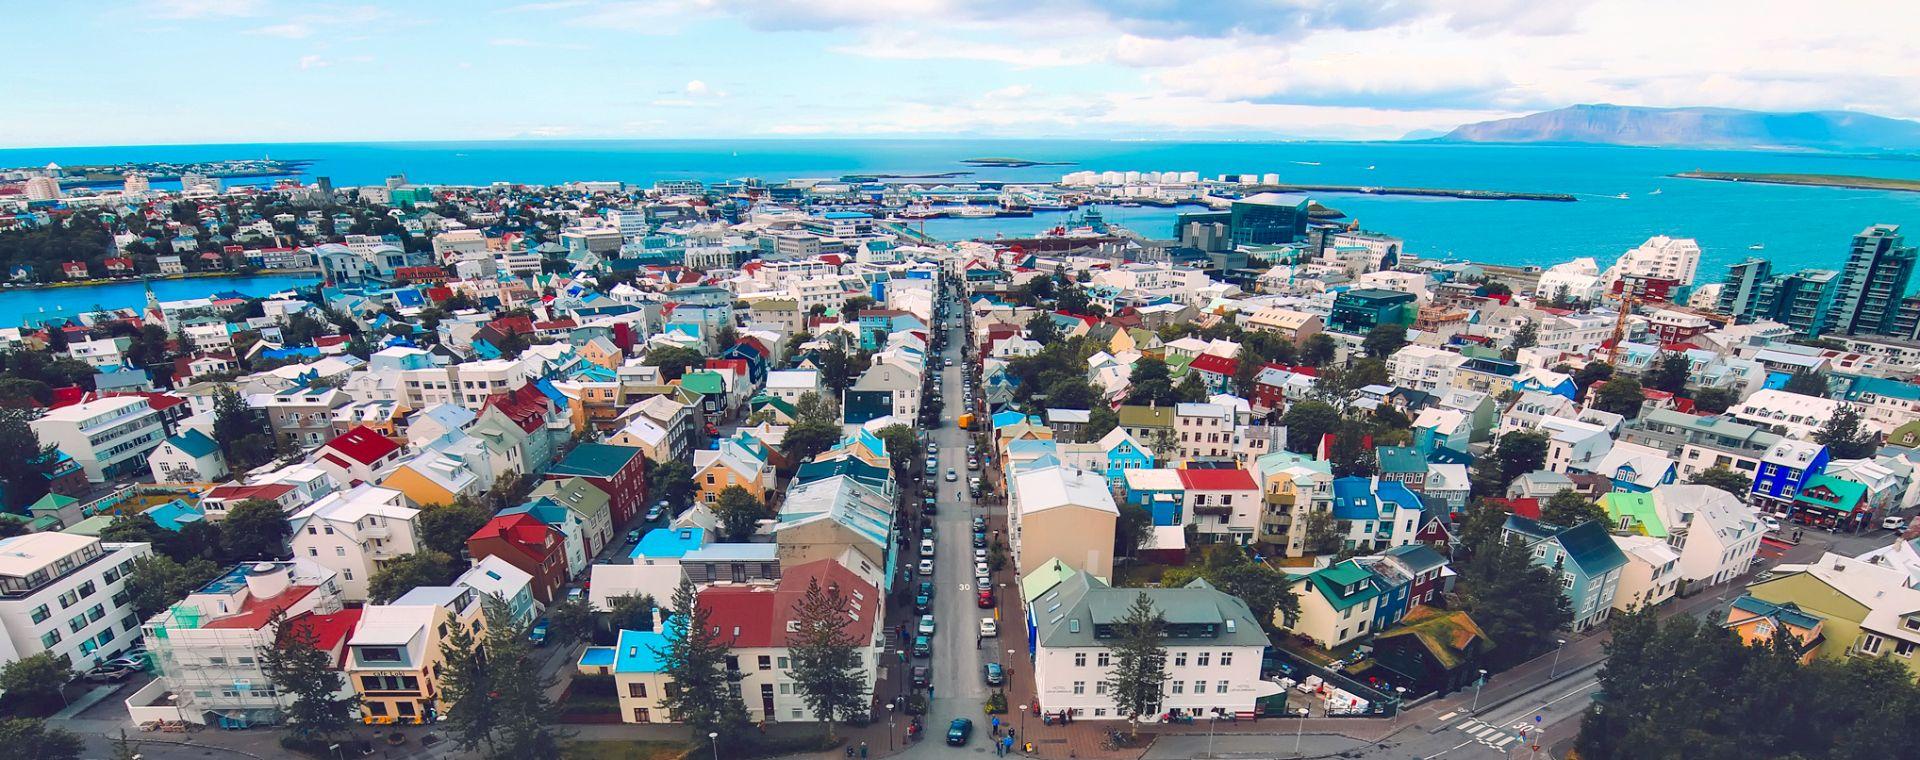 Image Voyage au Sud, l'Islande intime